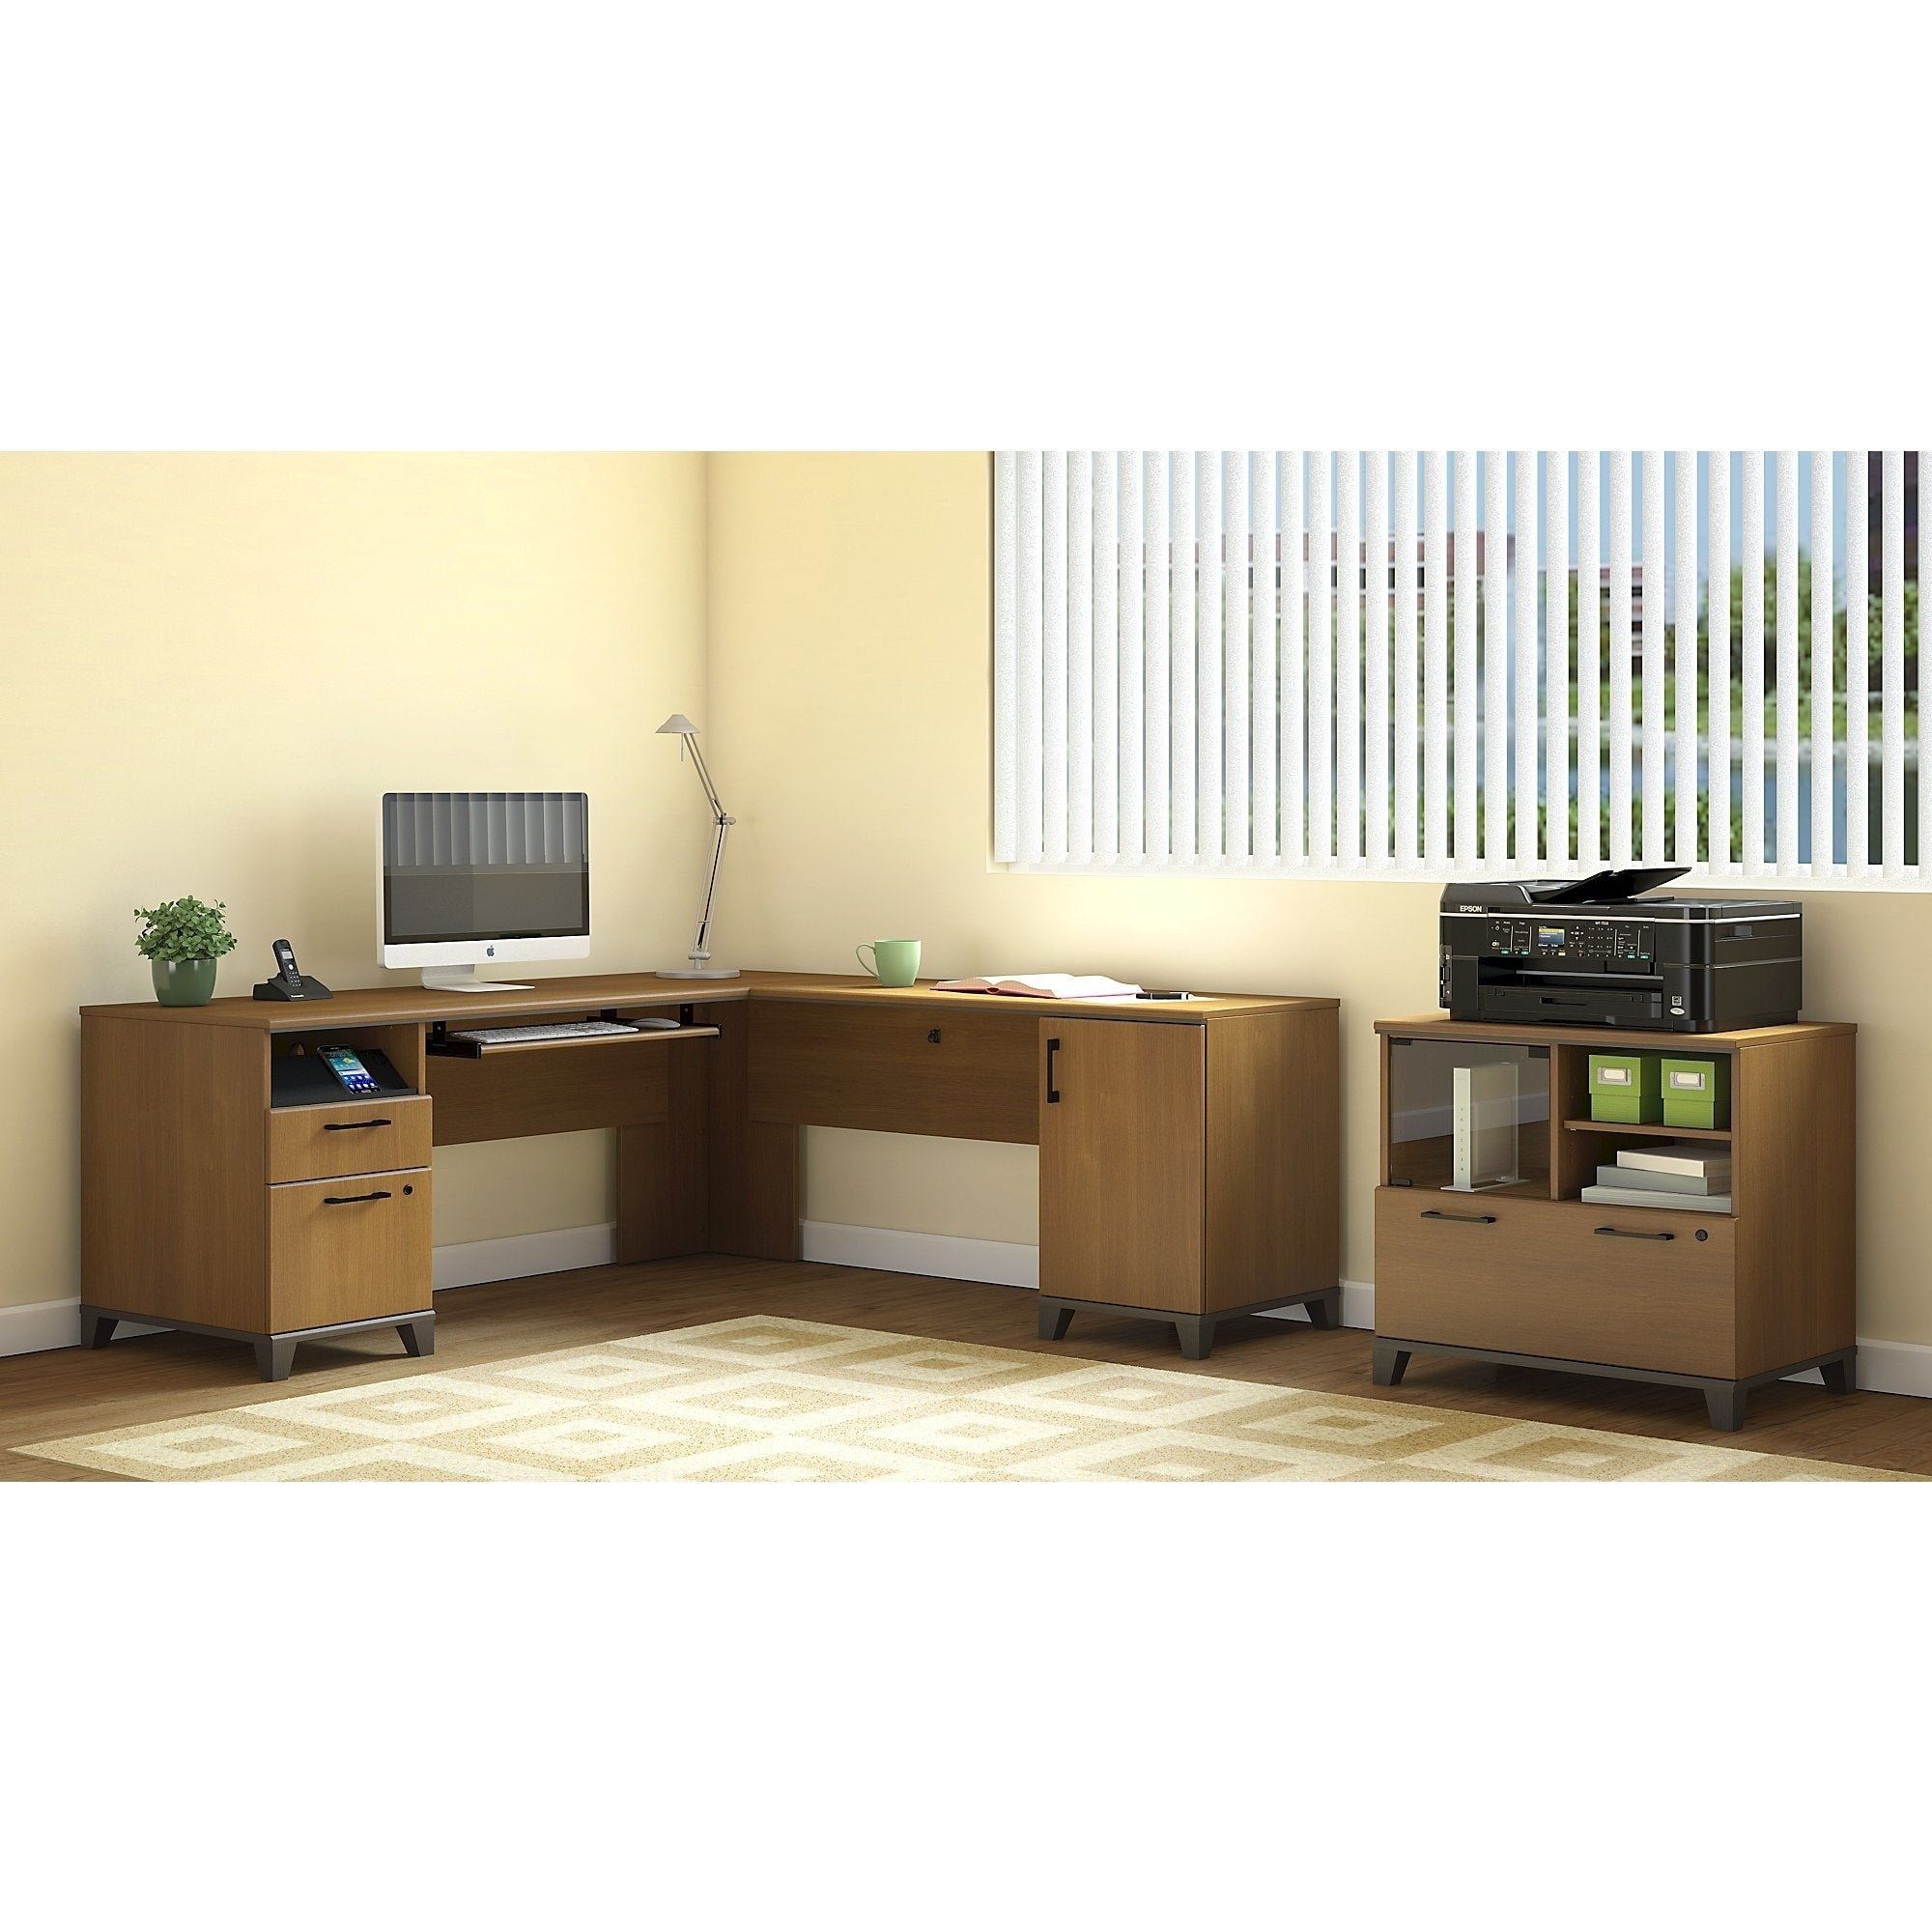 Bush Furniture Achieve L Shaped Desk with Printer Stand F...